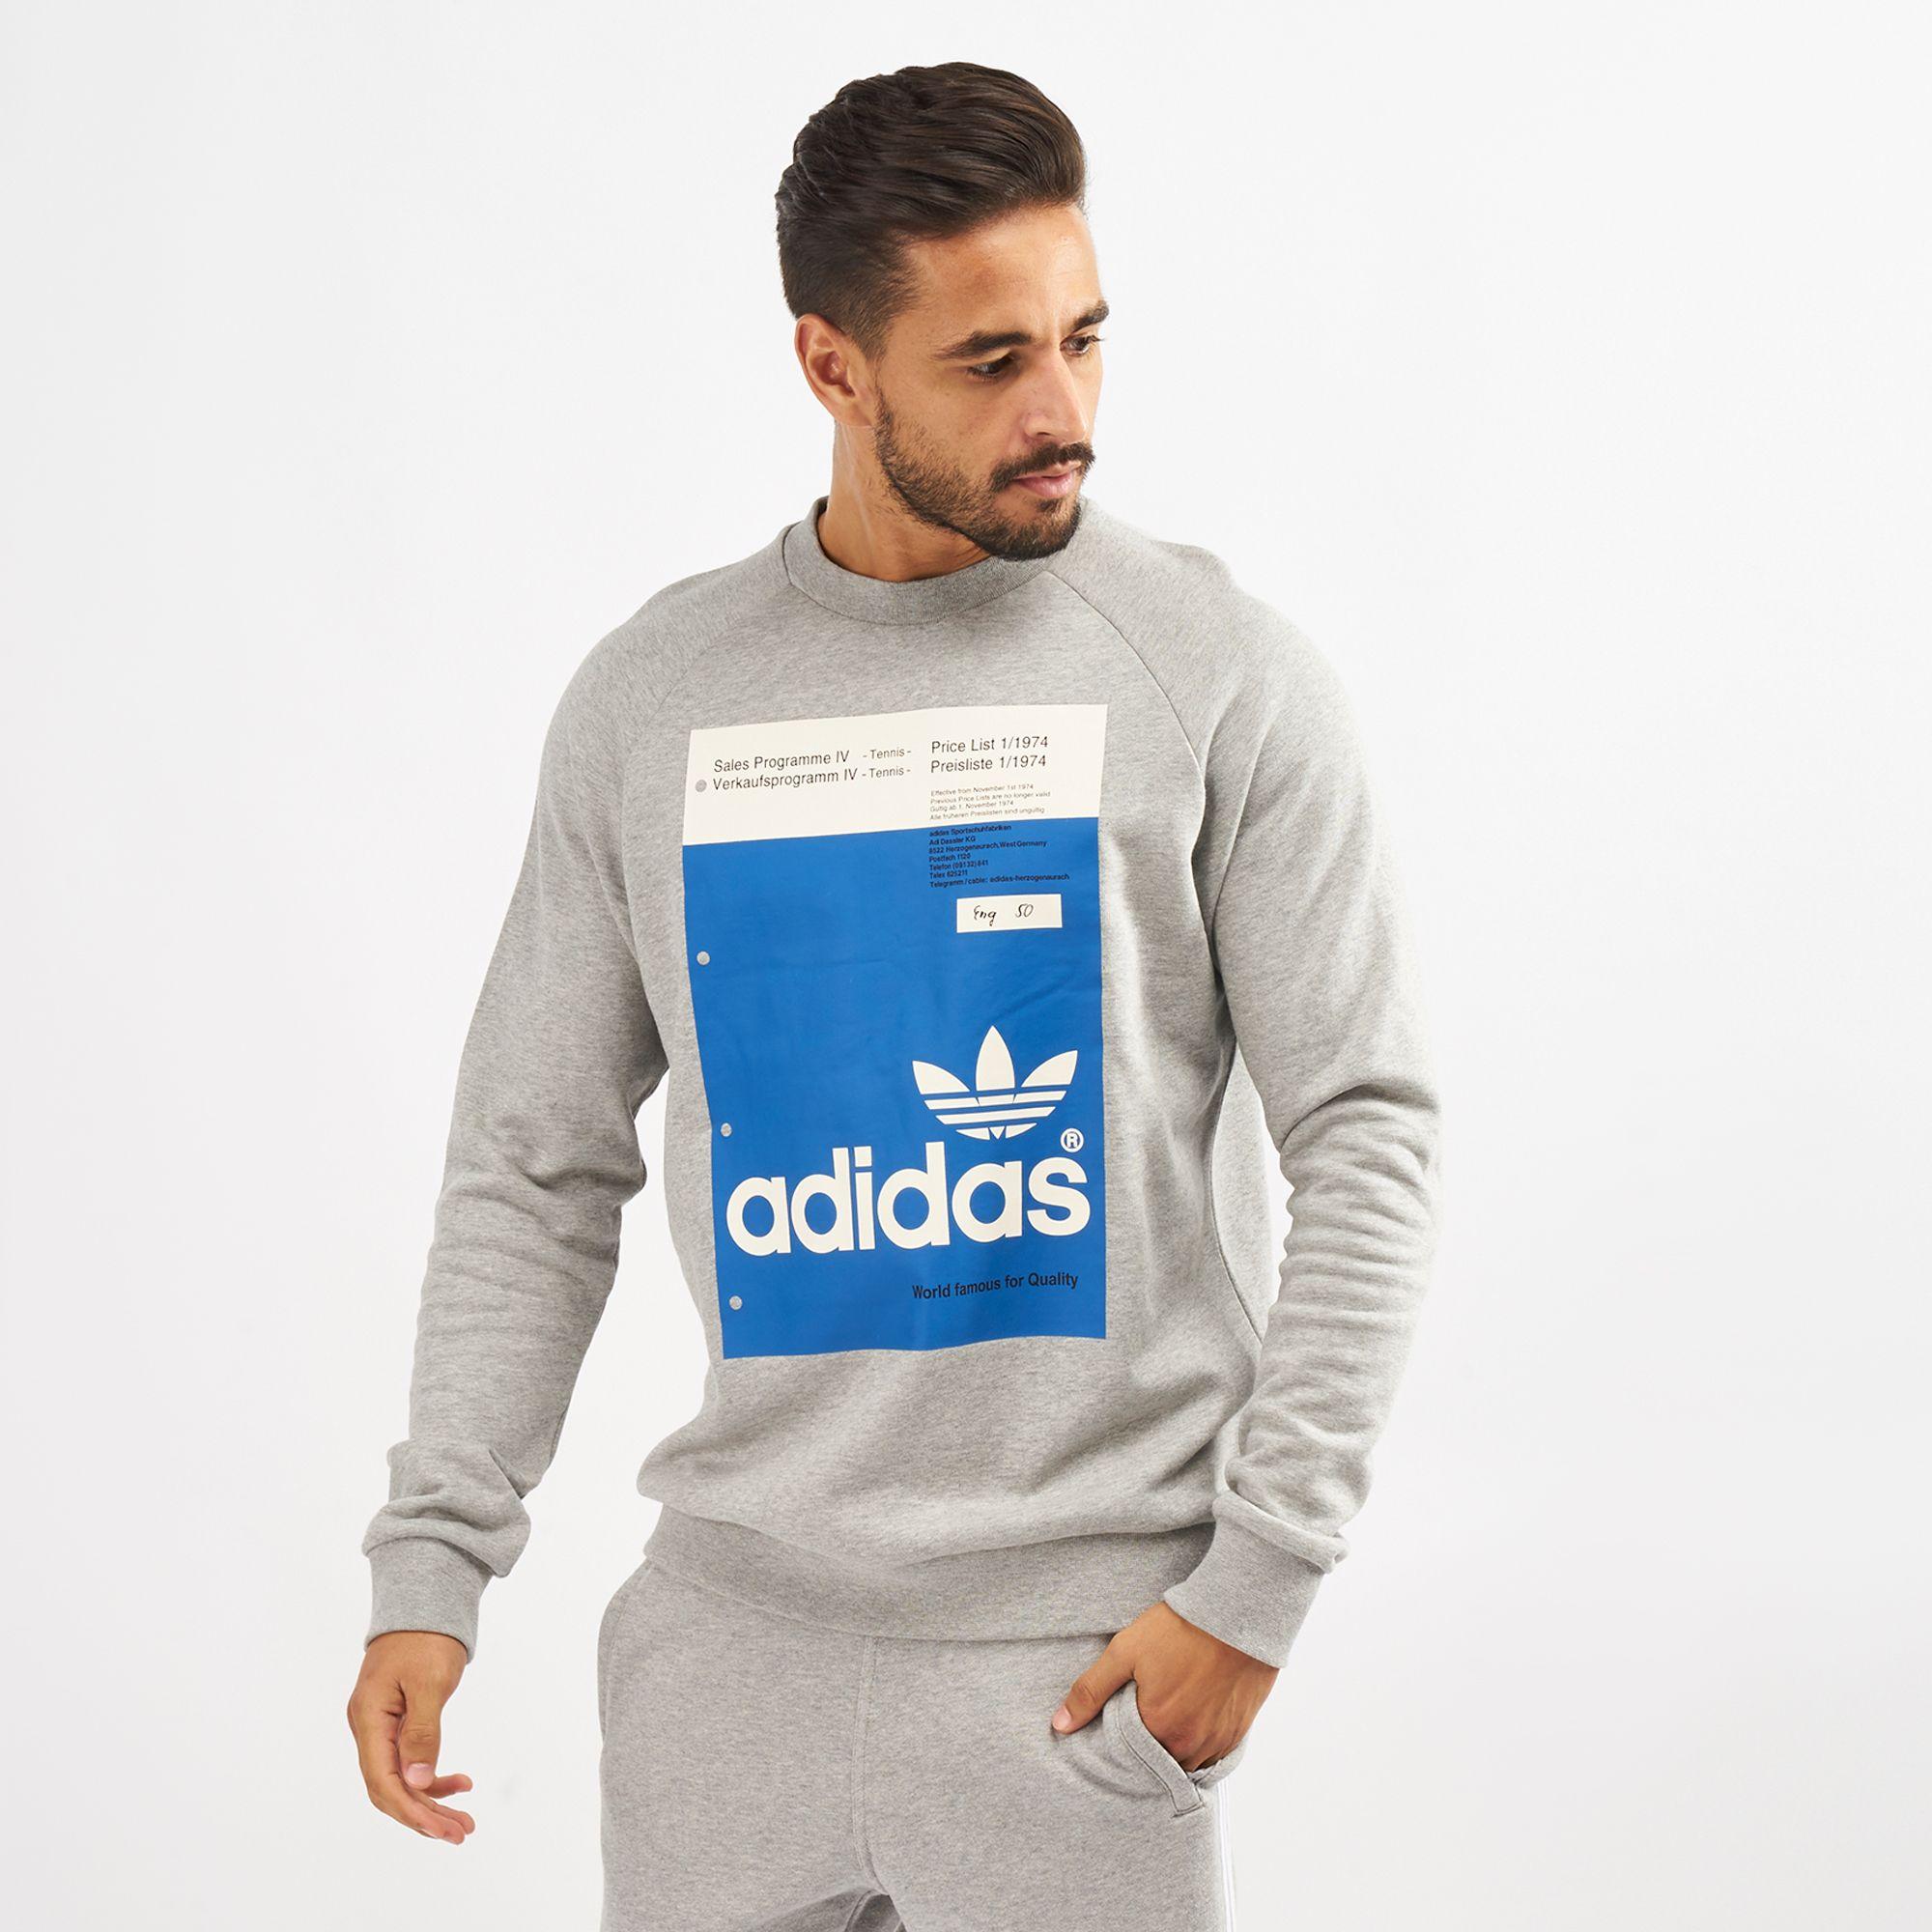 45677f32e9 adidas Originals Pantone Sweatshirt